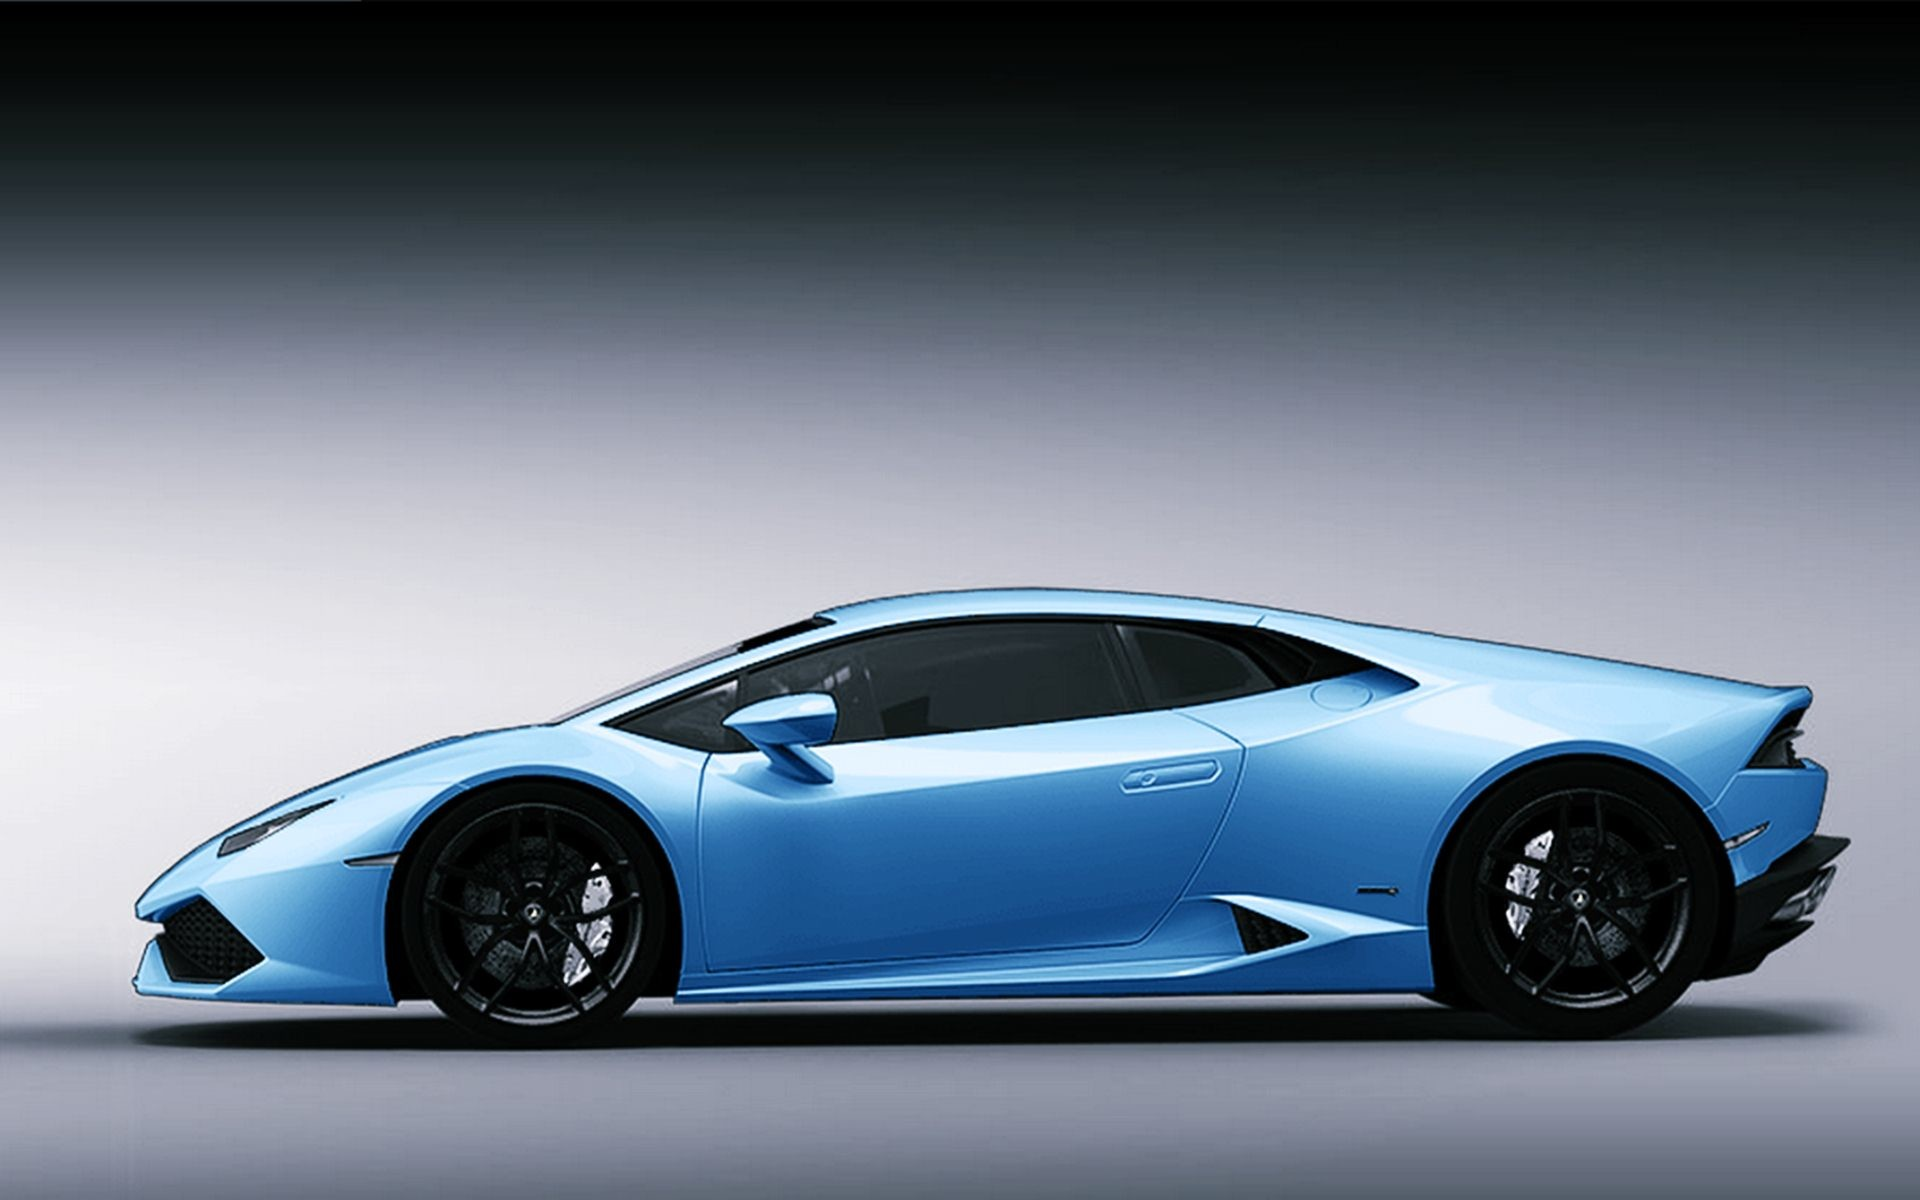 Res: 1920x1200, Blue Lamborghini Wallpapers 596 Cool Wallpaper